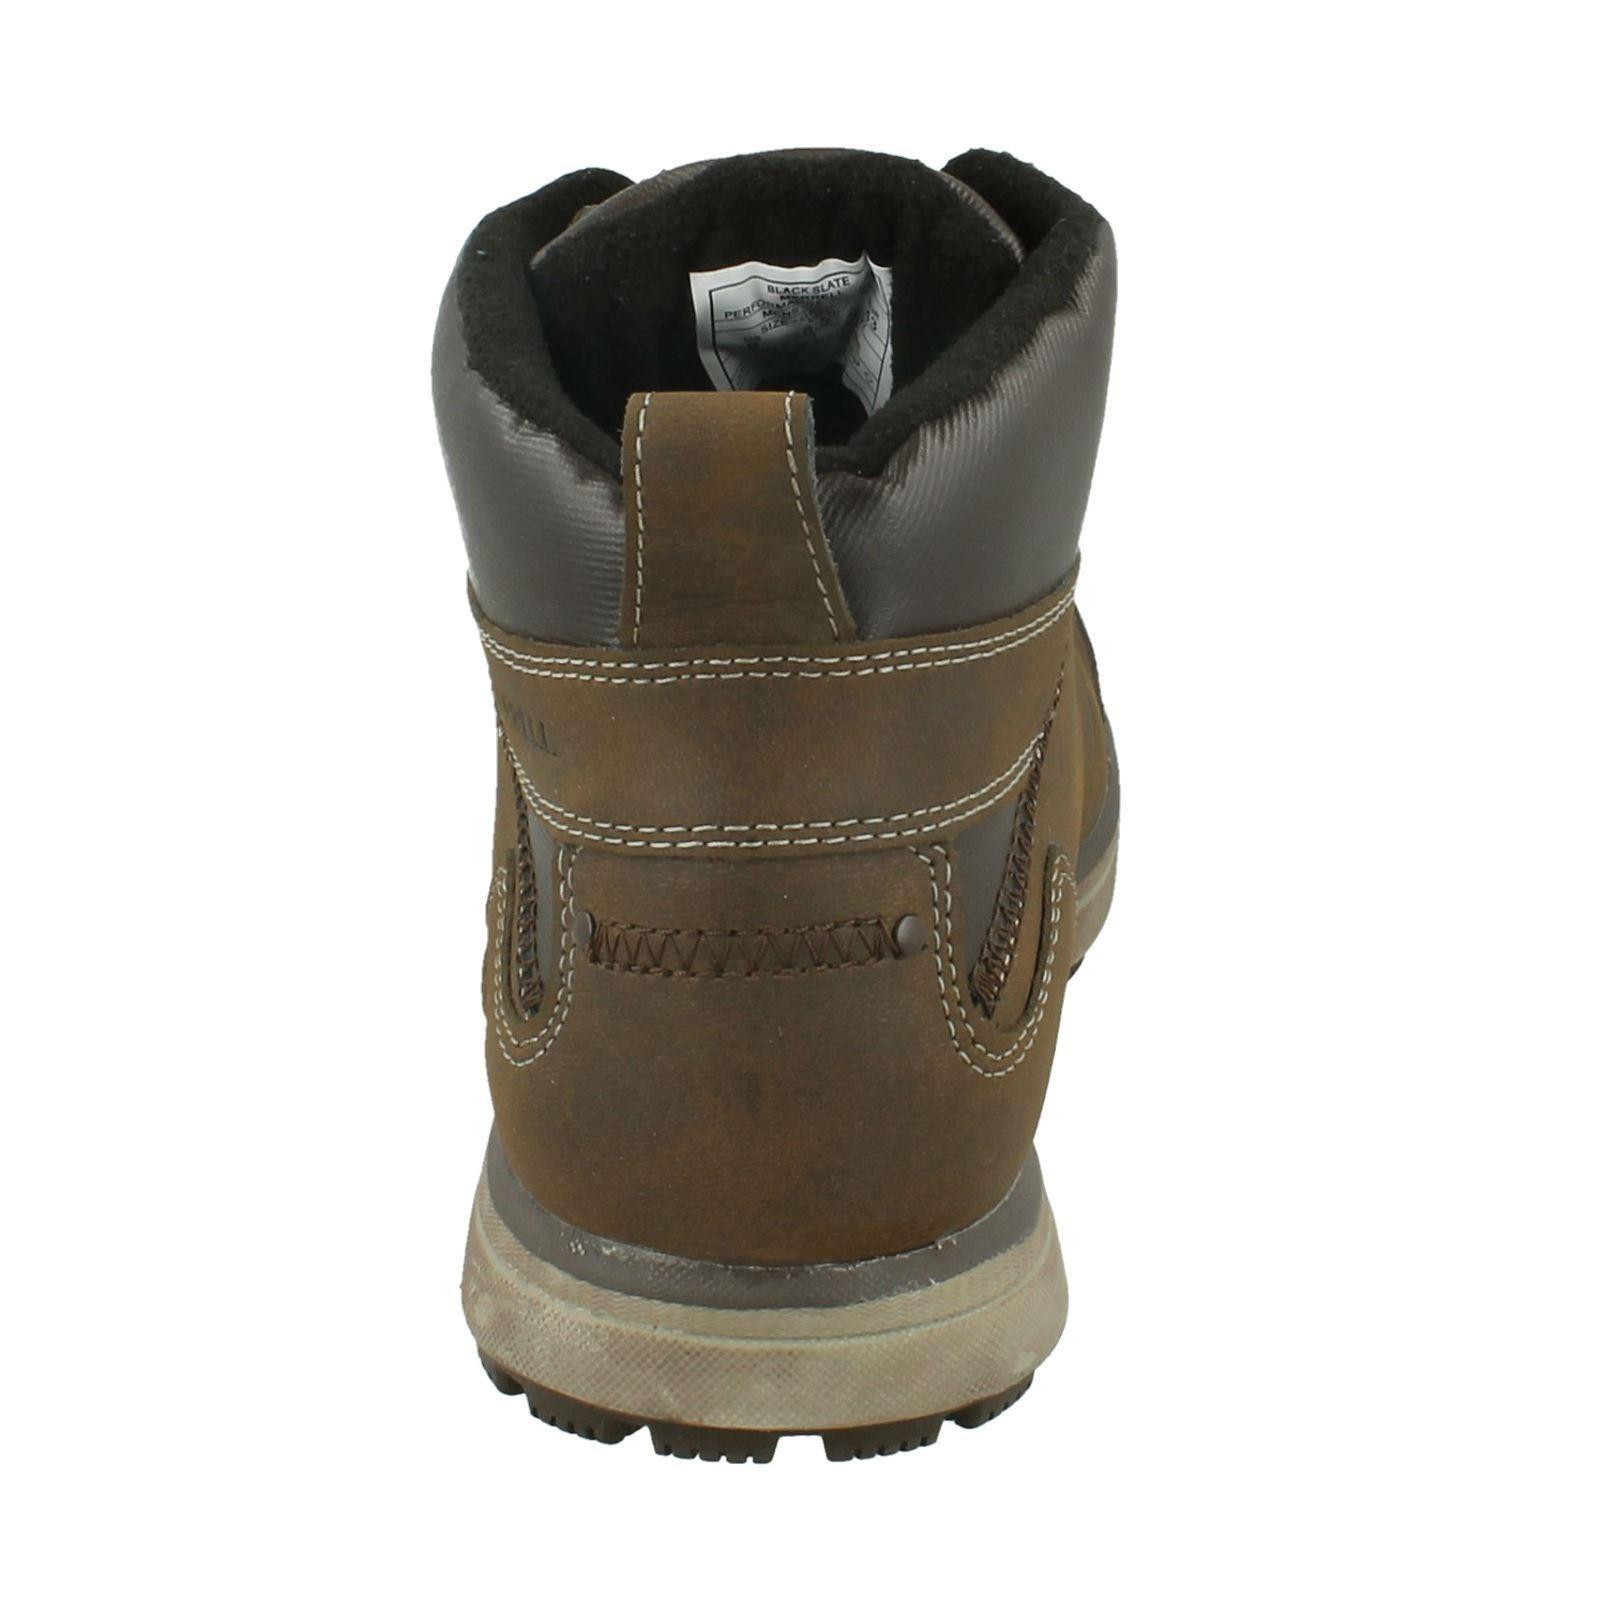 Herren Merrell Turku Trek Waterproof Mid Mid Mid Hiking Walking Stiefel- Label J23627 133608